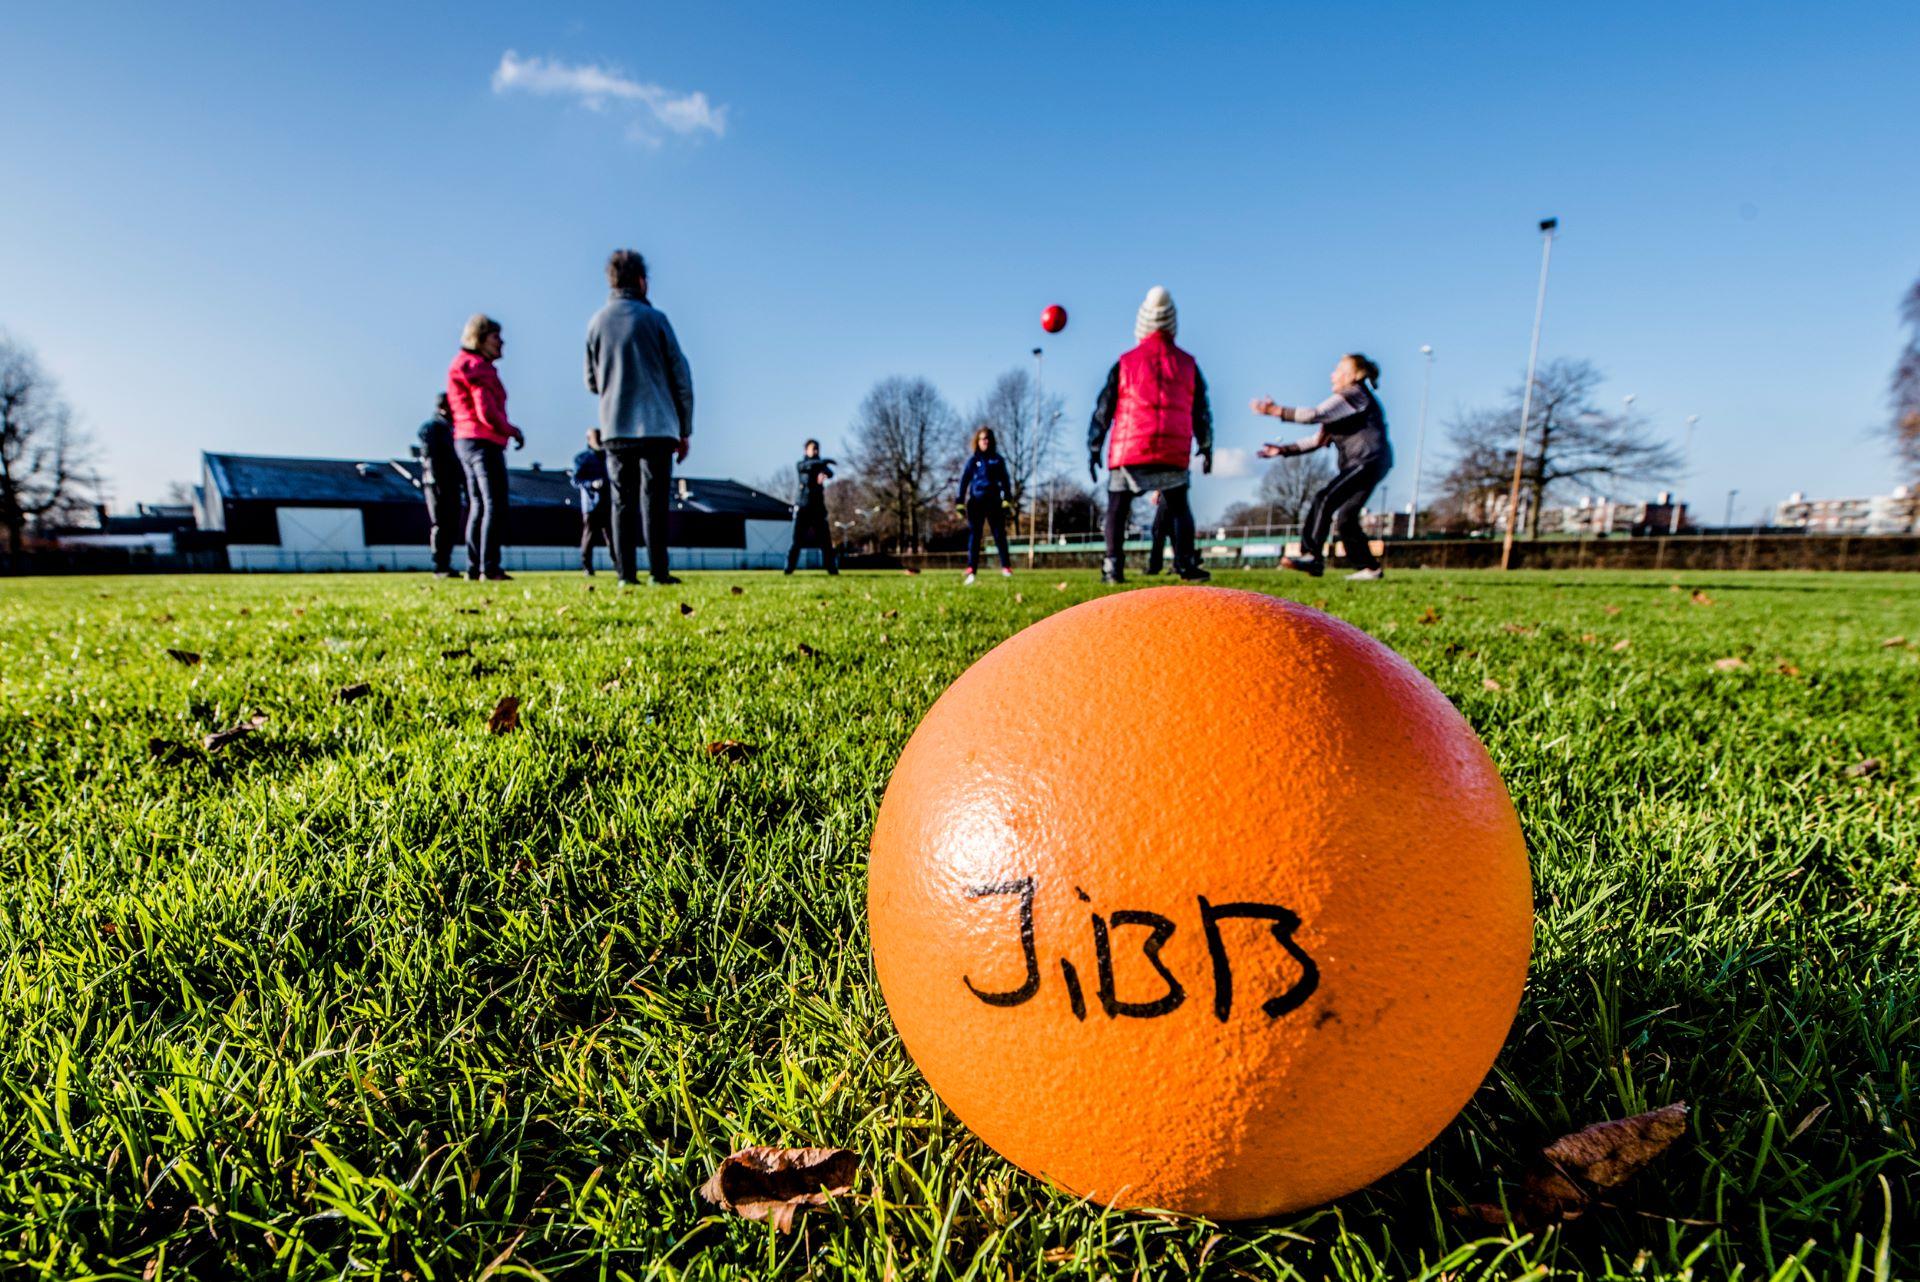 Sfeerfoto sportende senioren tijdens JIBB Golden Sports bij OEC Korfbal